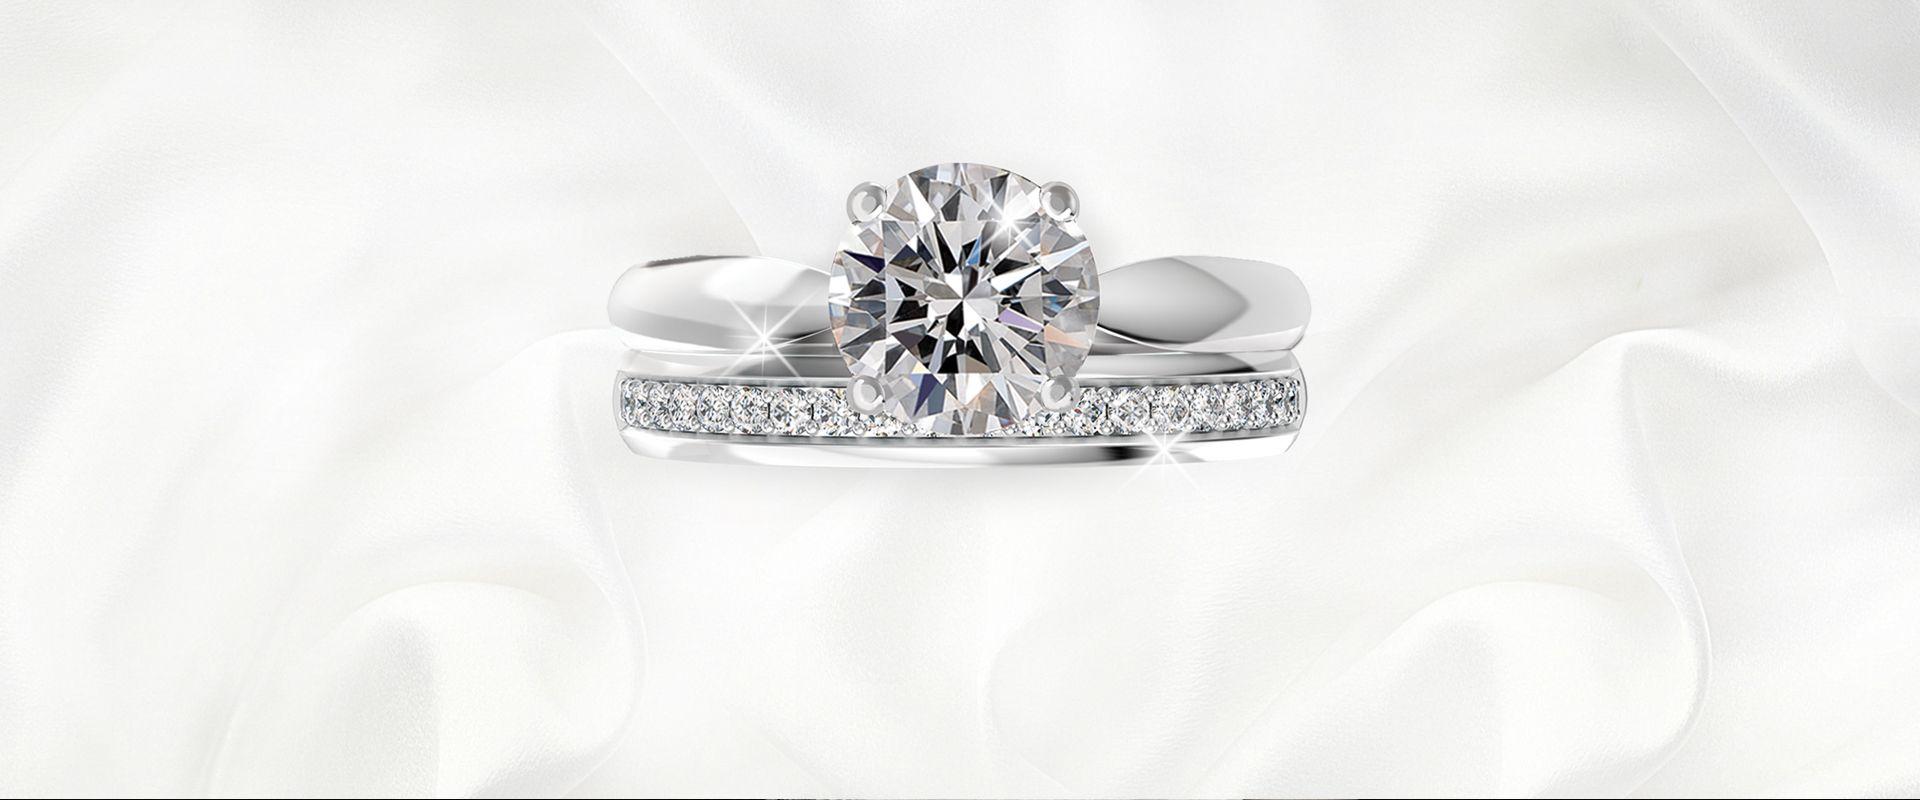 Engagement Rings Fine Jewellery Since 1933 Jack Friedman